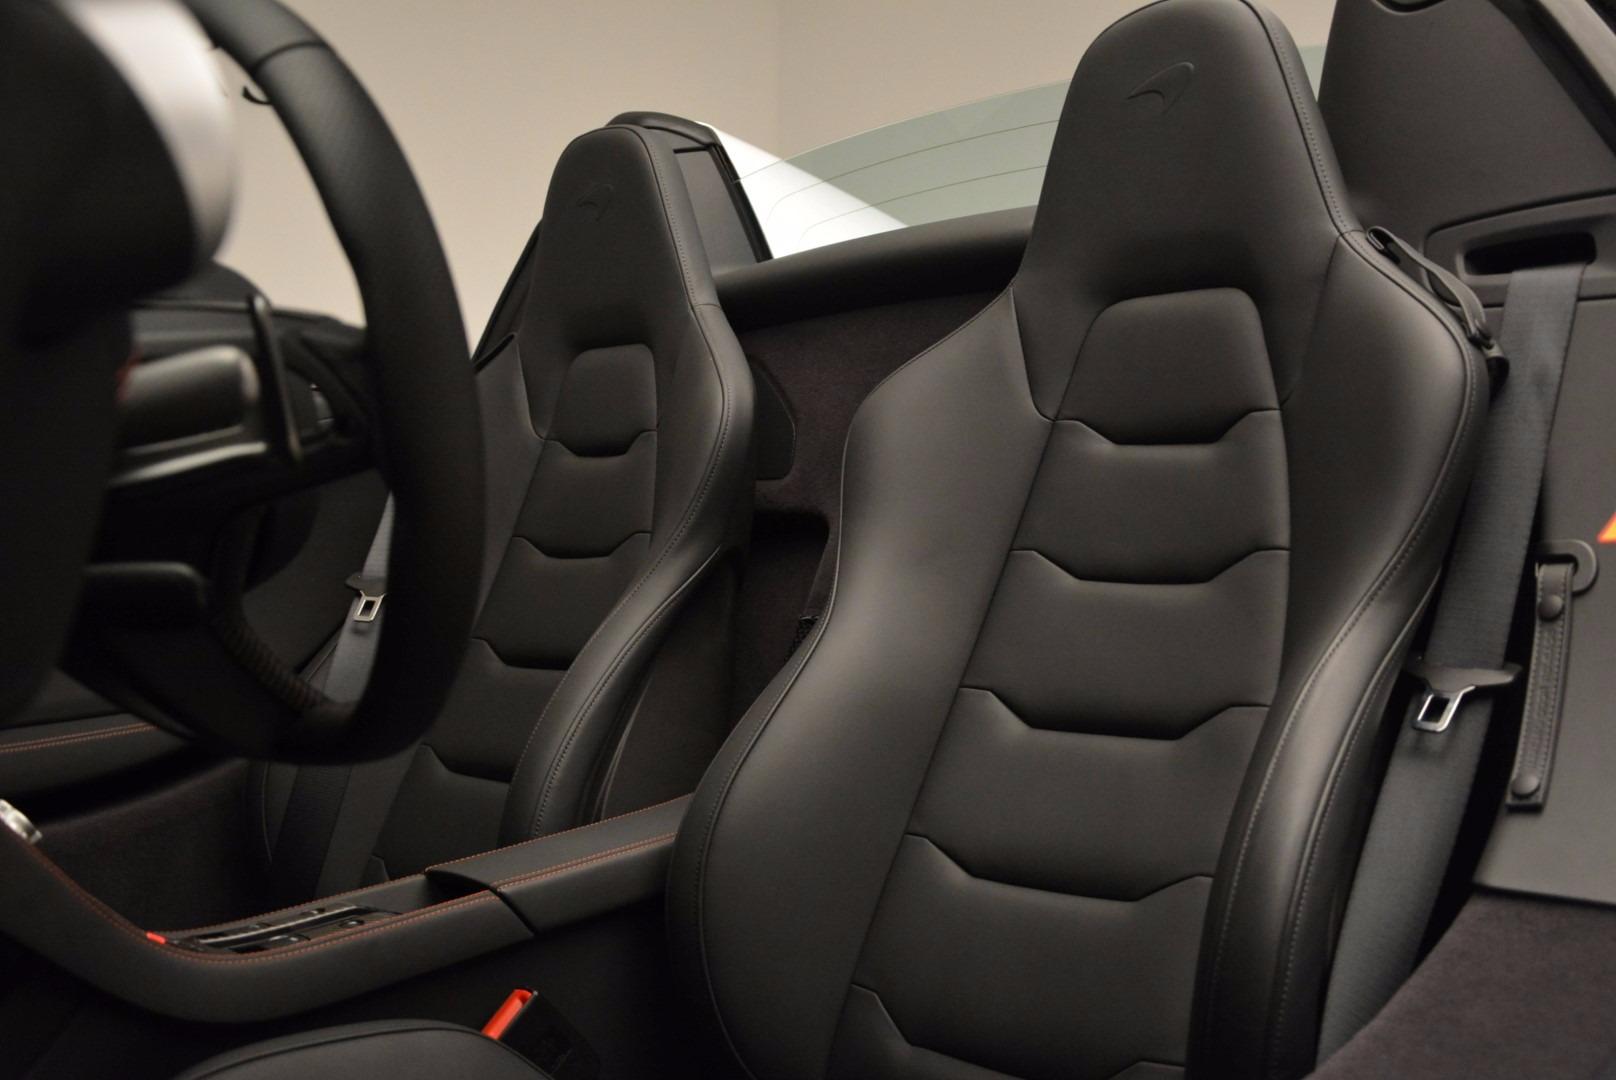 Used 2014 McLaren MP4-12C Spider  For Sale In Greenwich, CT. Alfa Romeo of Greenwich, 3089 627_p24